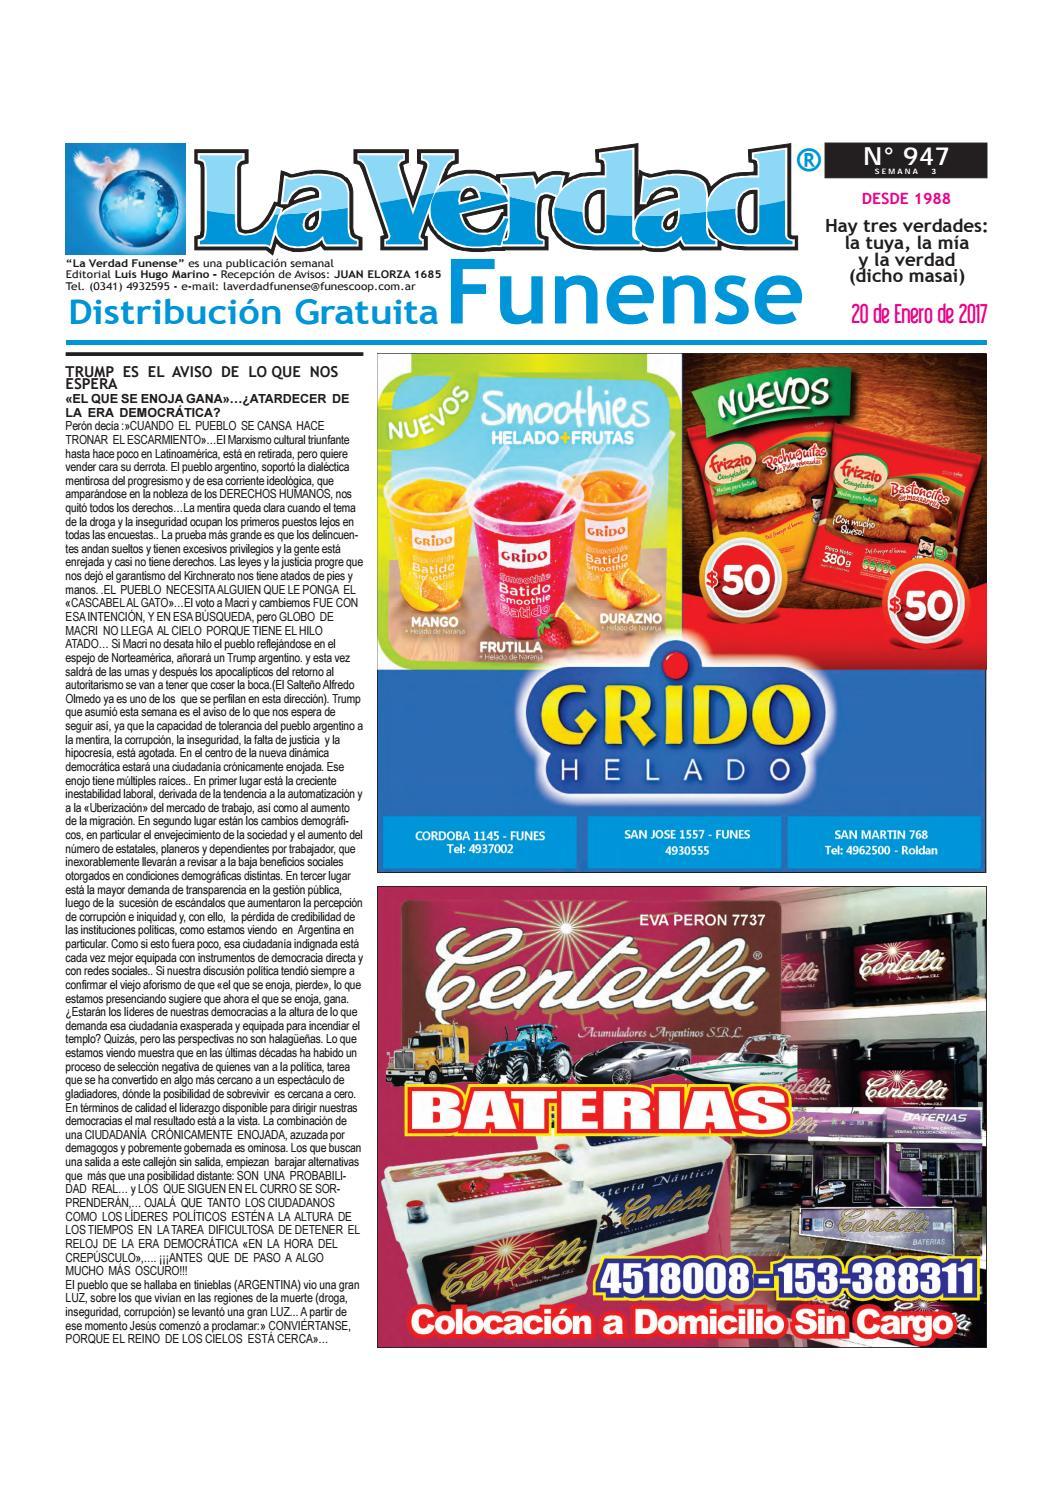 promo code acd78 3ab3b 947 20 01 by La Verdad Funense - issuu